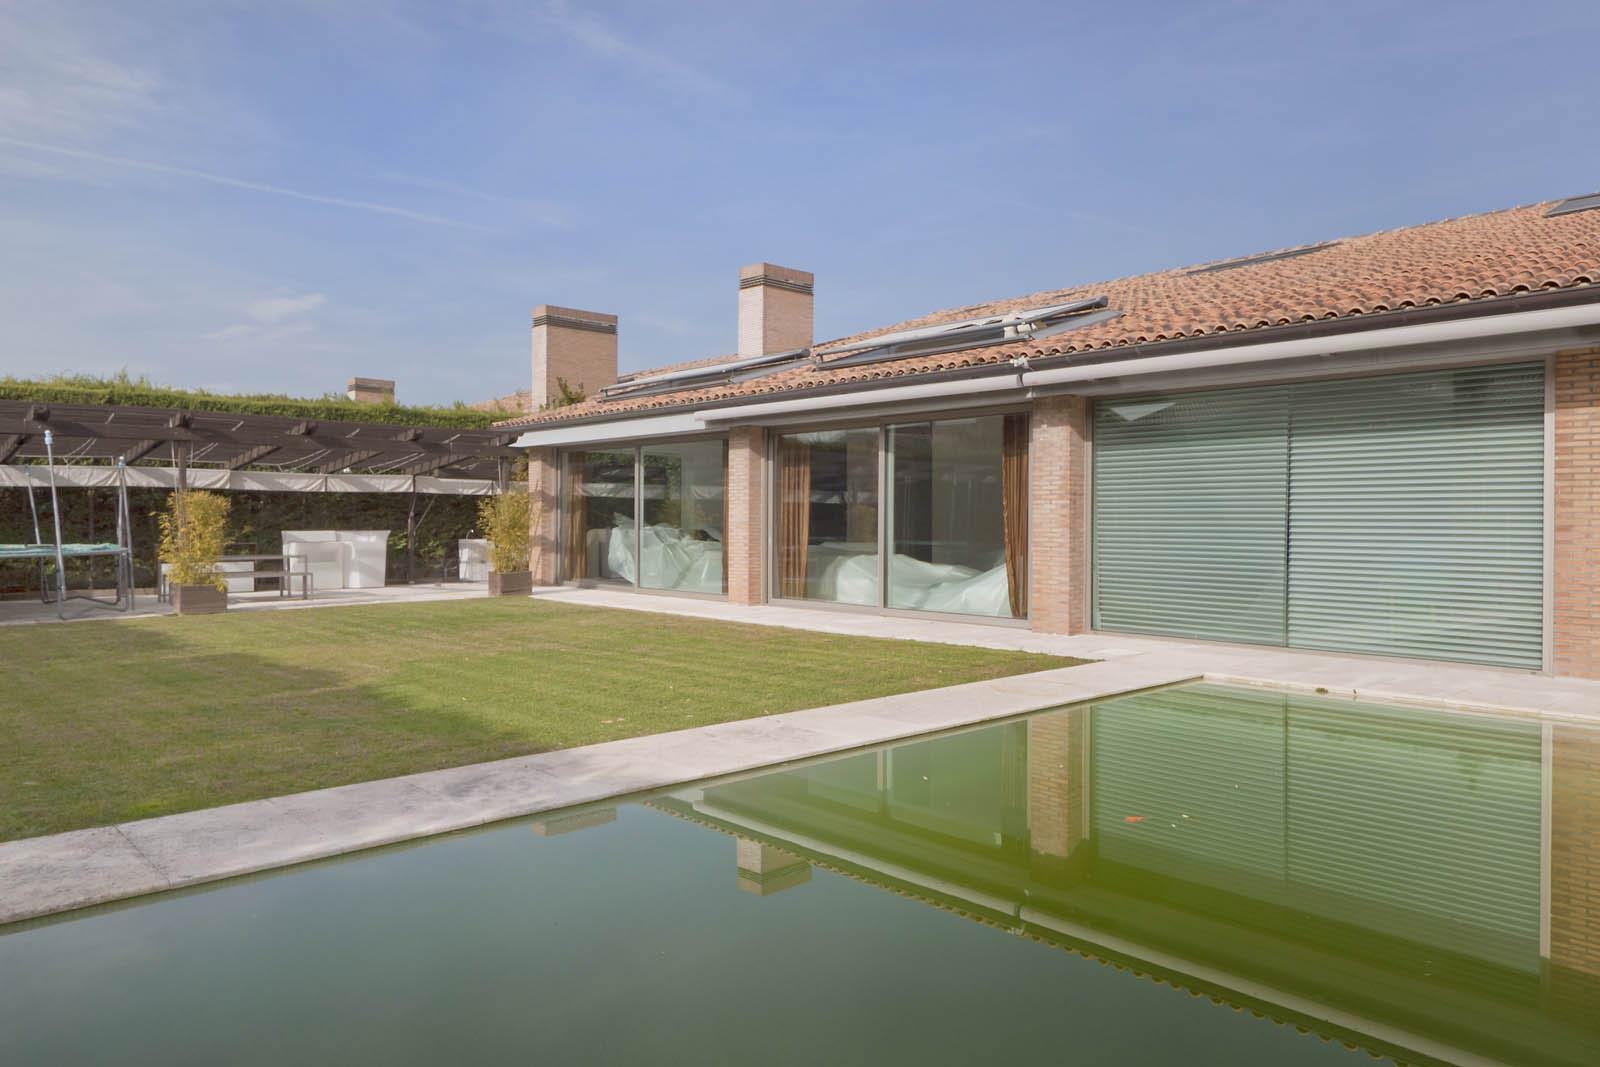 La finca madrid real estate for La finca madrid